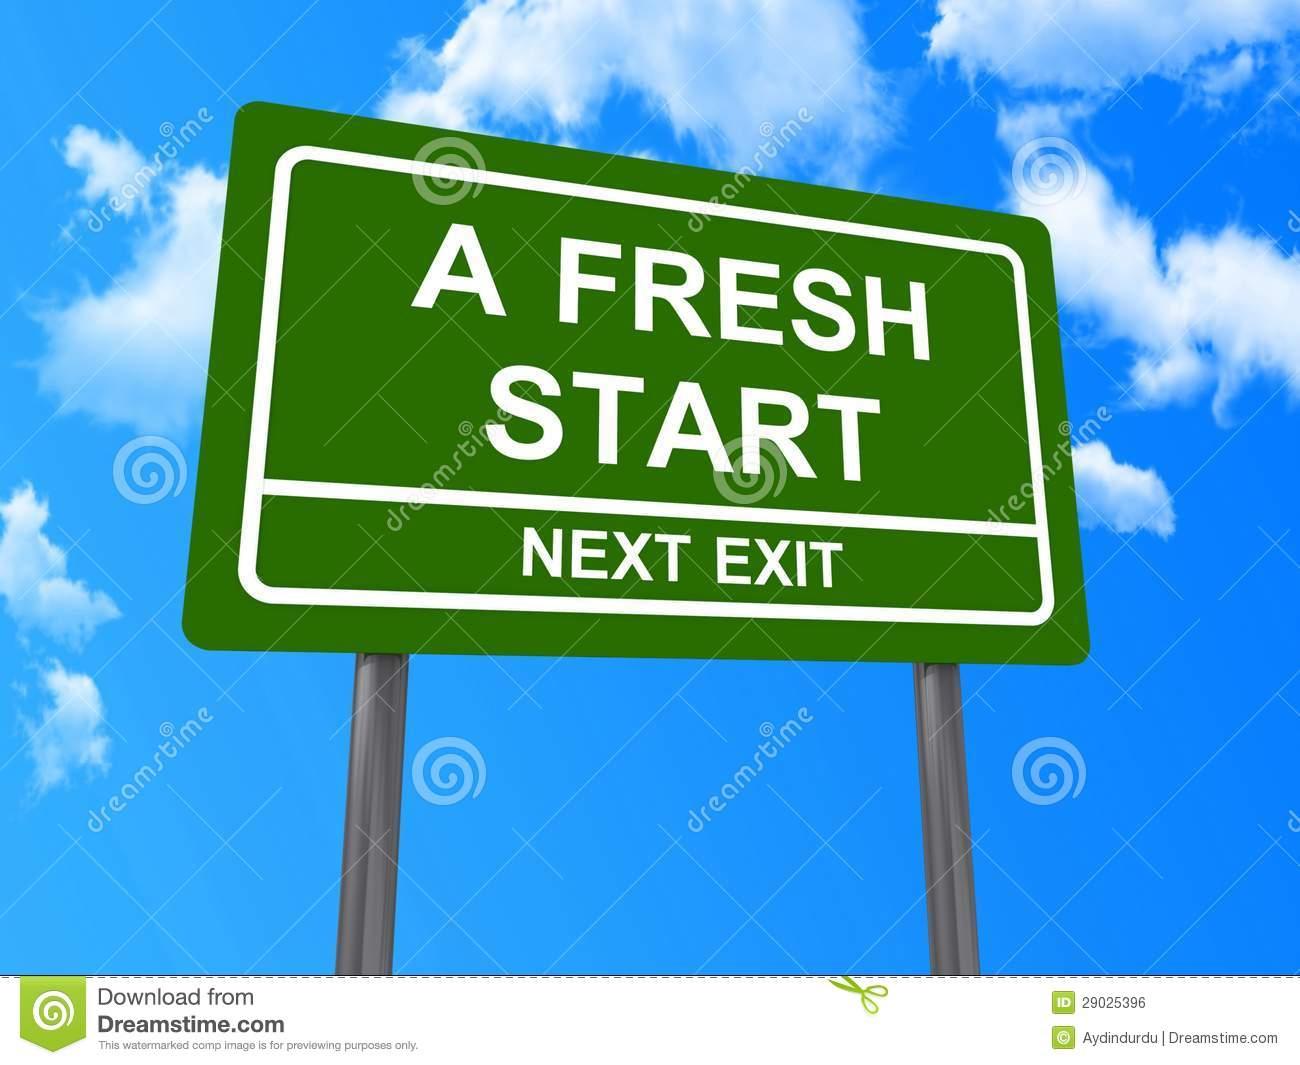 Fresh Start Clipart - Clipart Kid